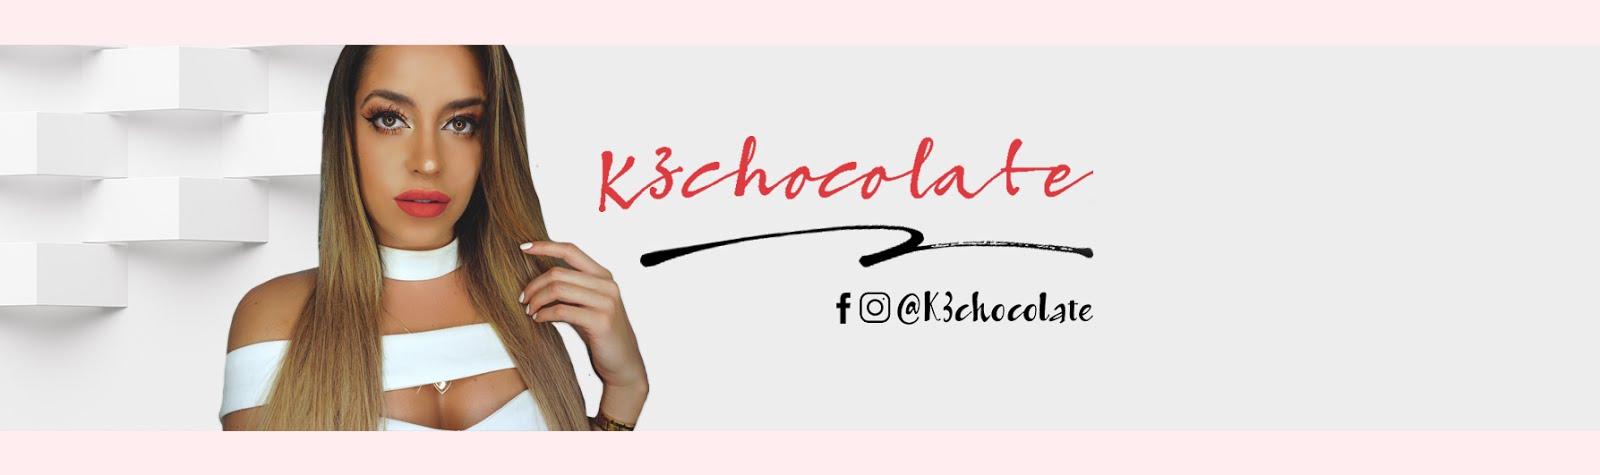 K3chocolate